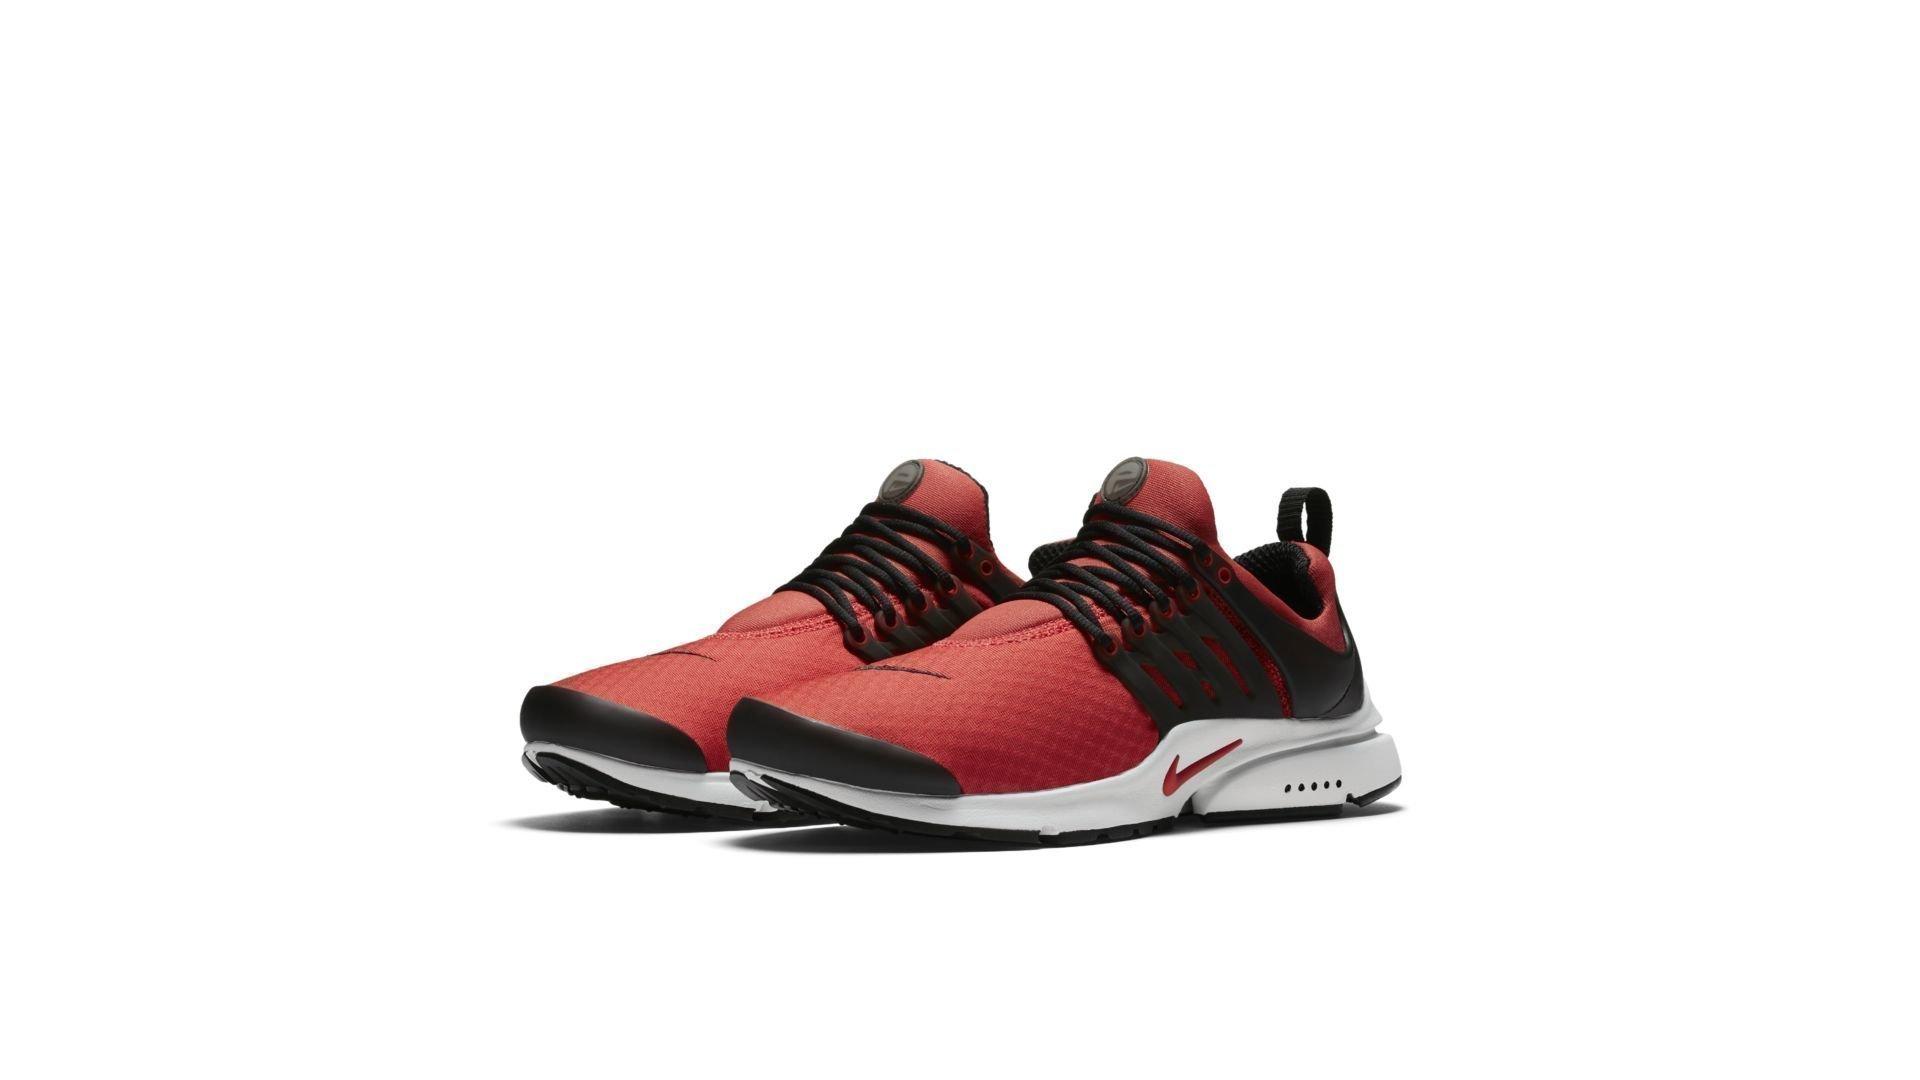 Nike Air Presto Track Red Black (848187-600)